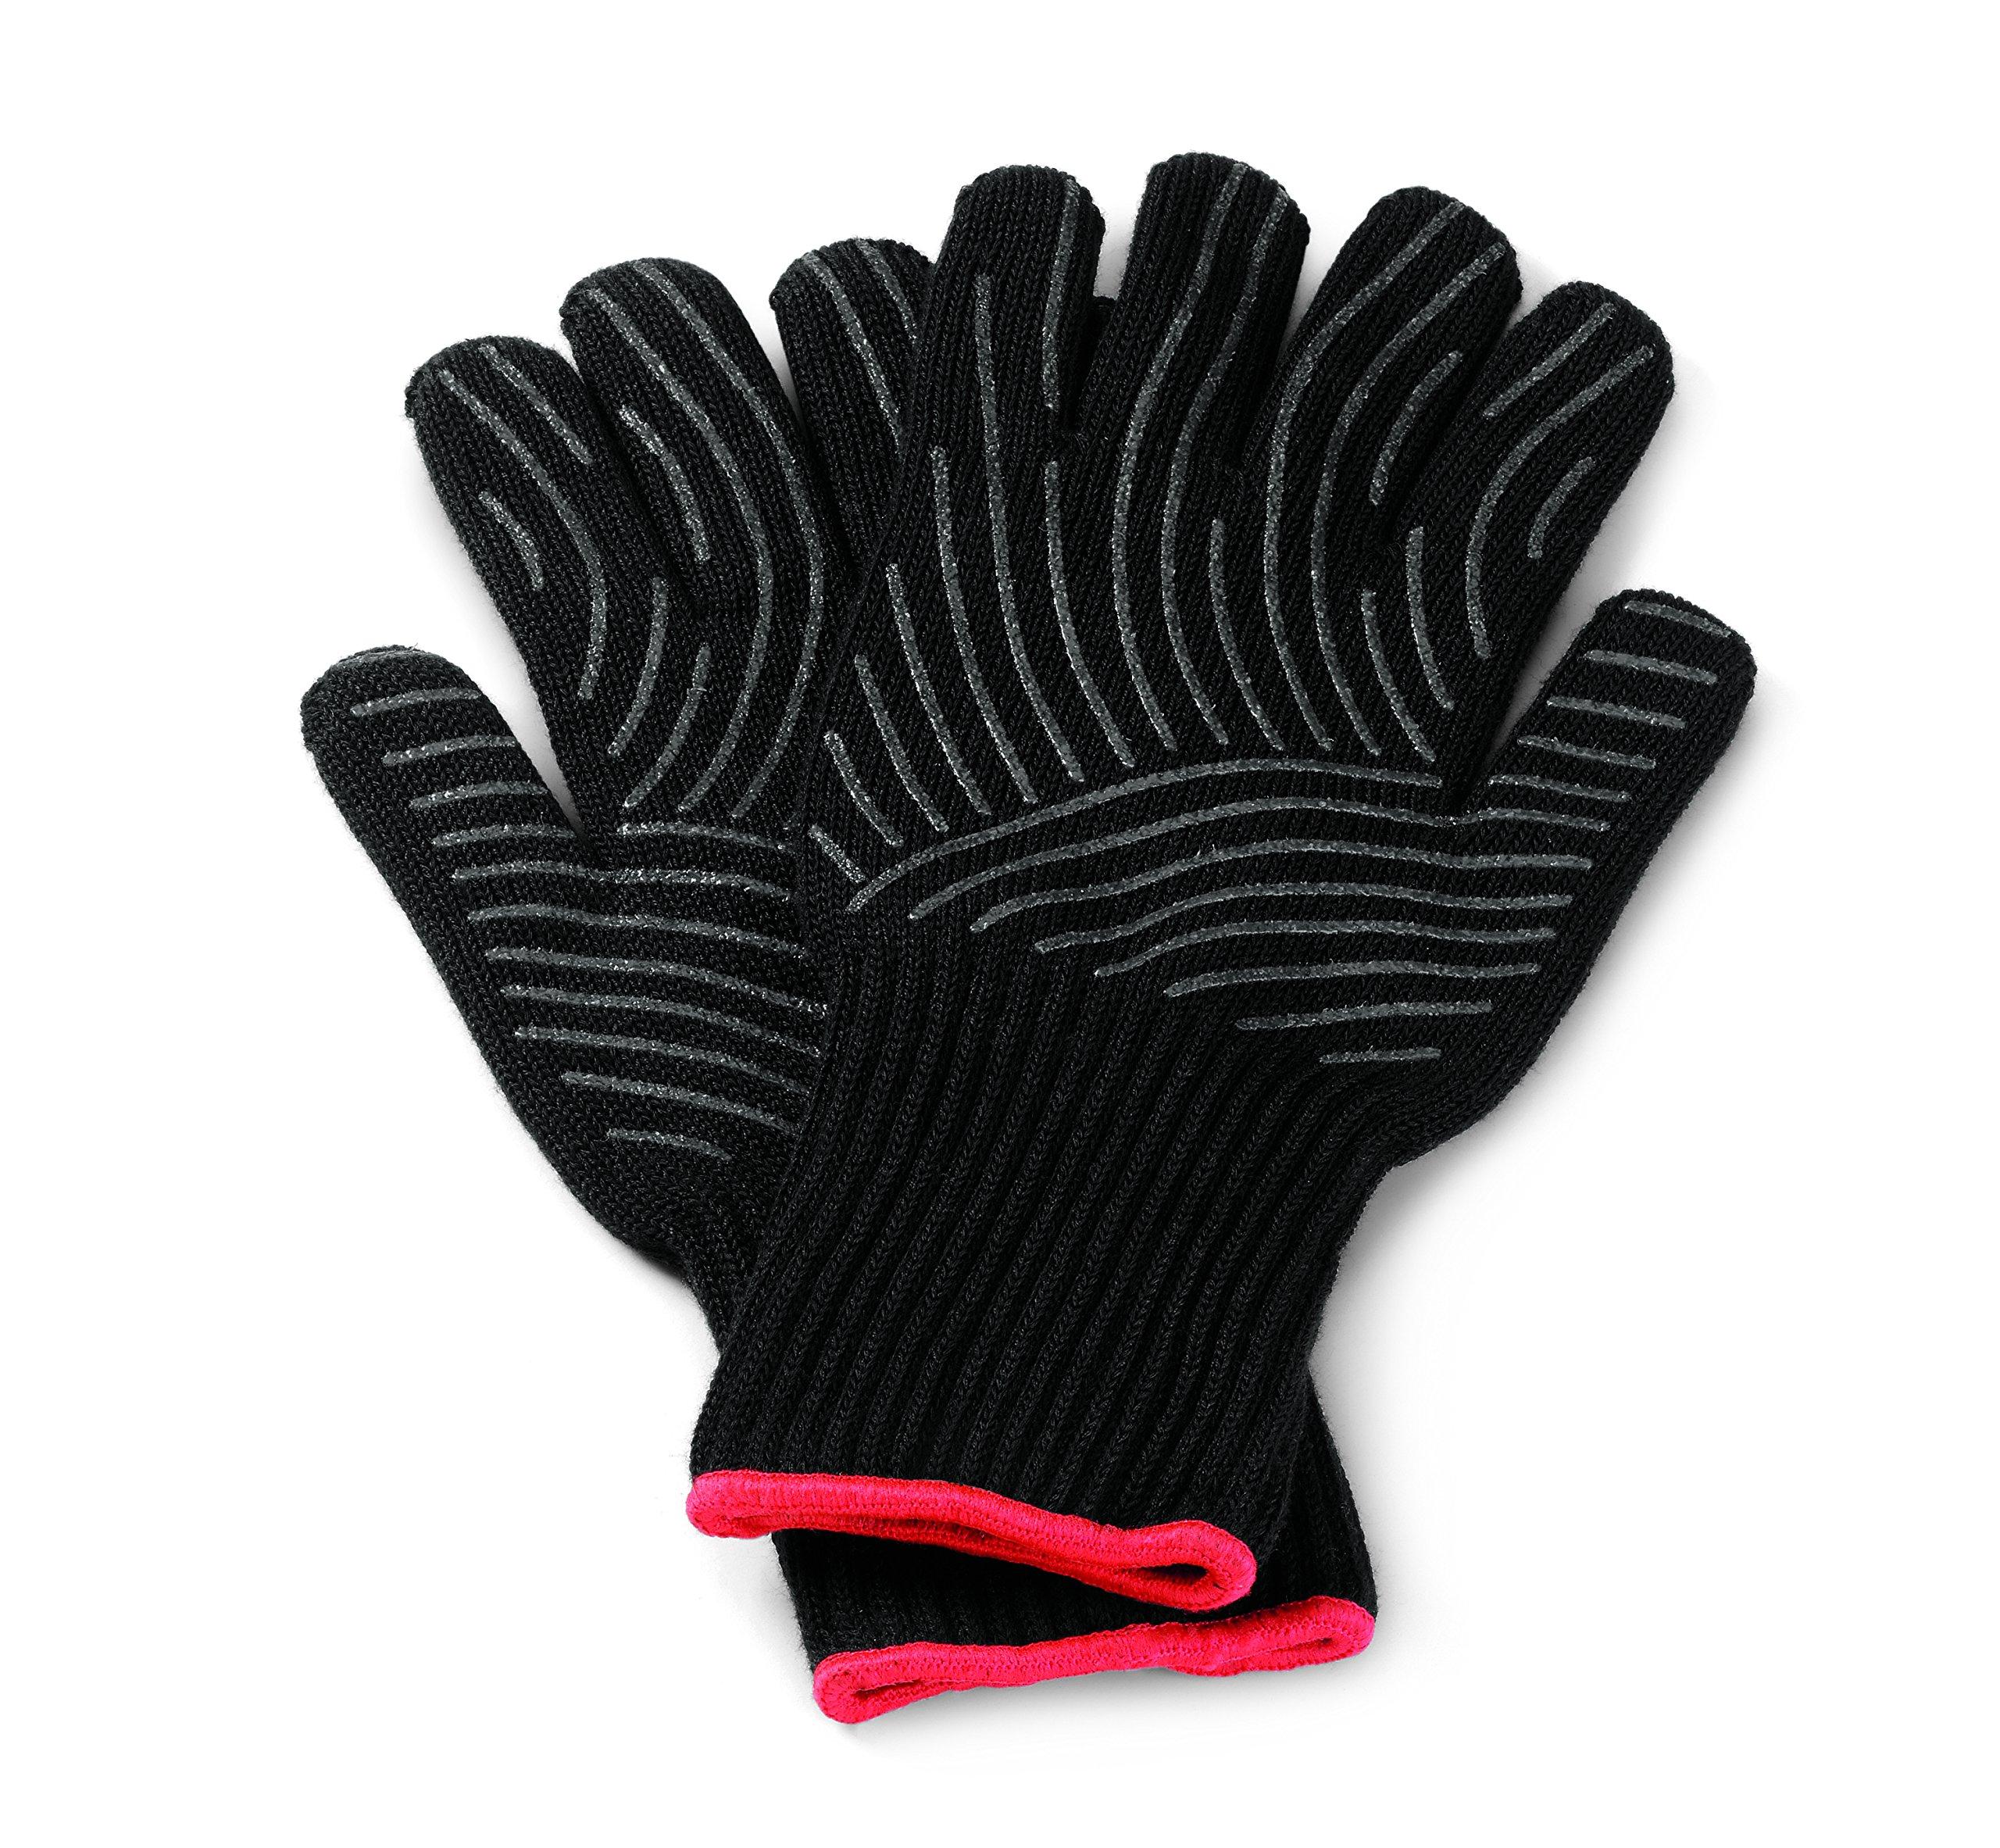 Weber Premium Gloves, S/M, Small/Medium by Weber